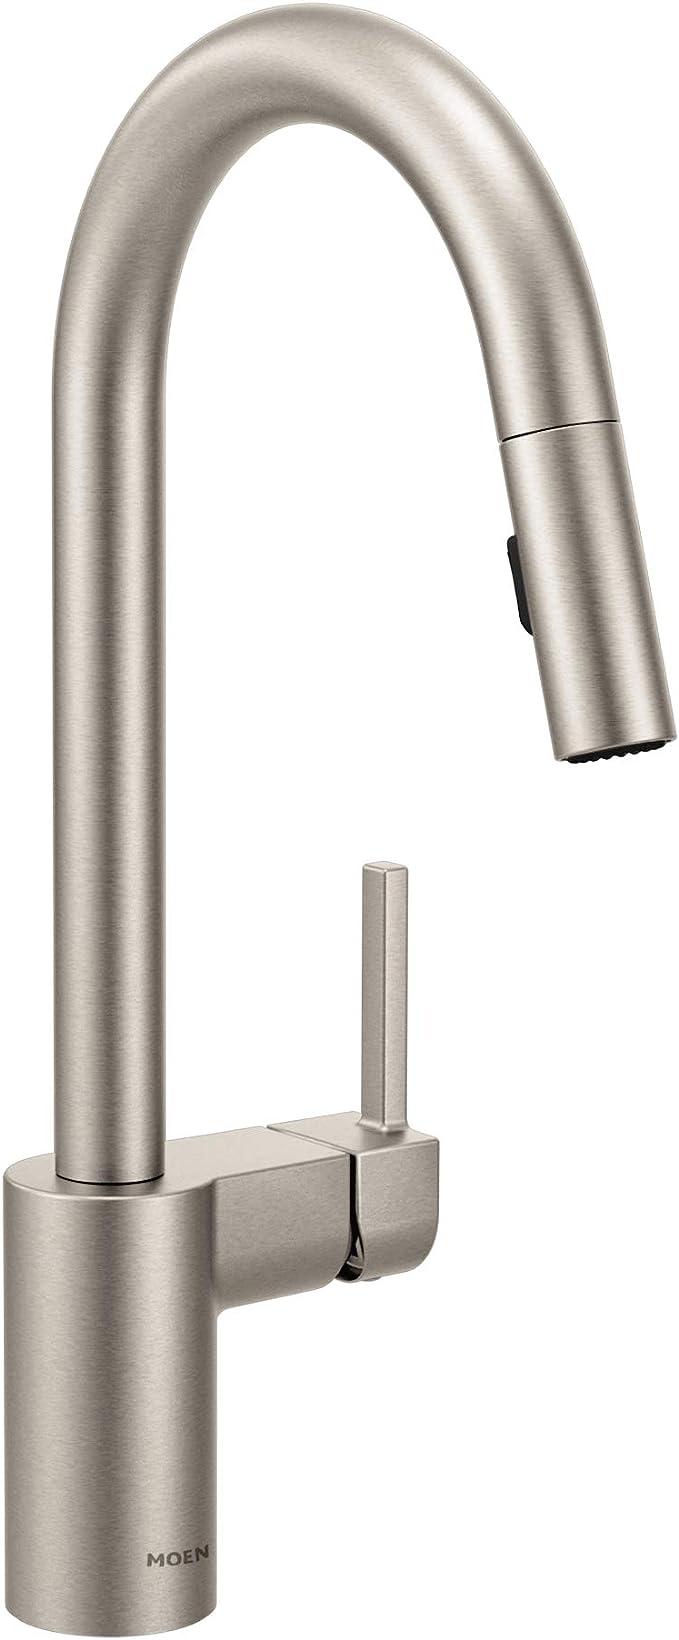 Moen 7565srs: Moen 7565SRS Align One-Handle High-Arc Pulldown Kitchen Faucet